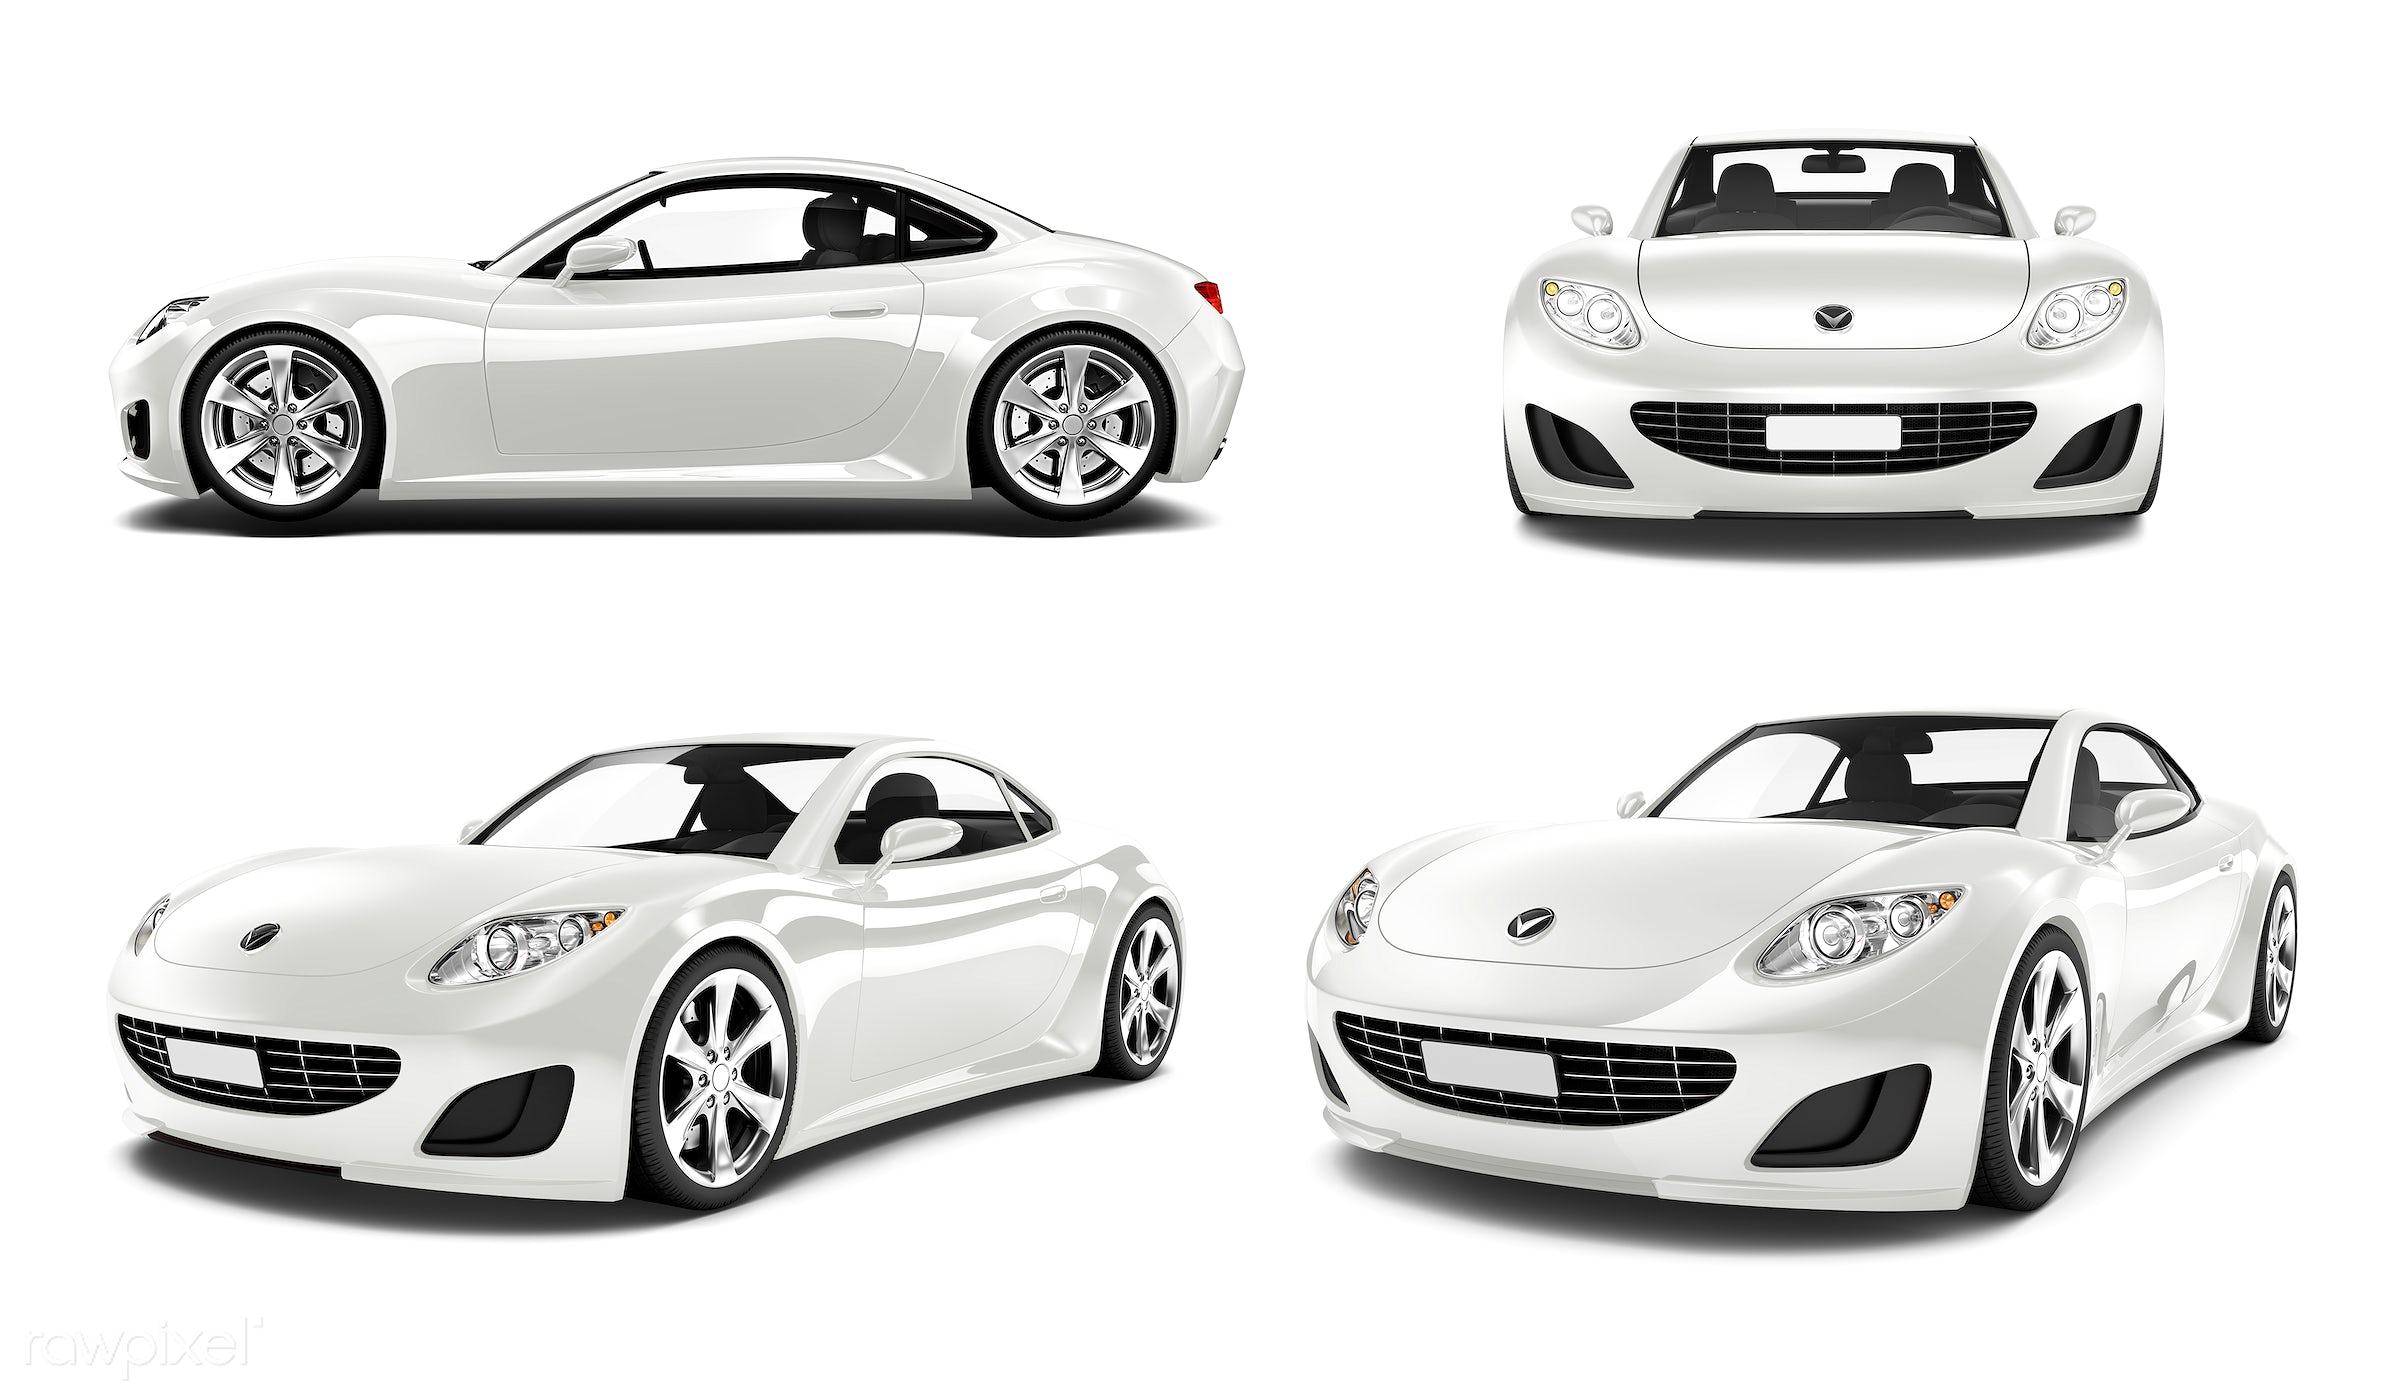 Three dimensional image of car - car, 3d, automobile, automotive, brandless, bronze, concept car, graphic, holiday,...